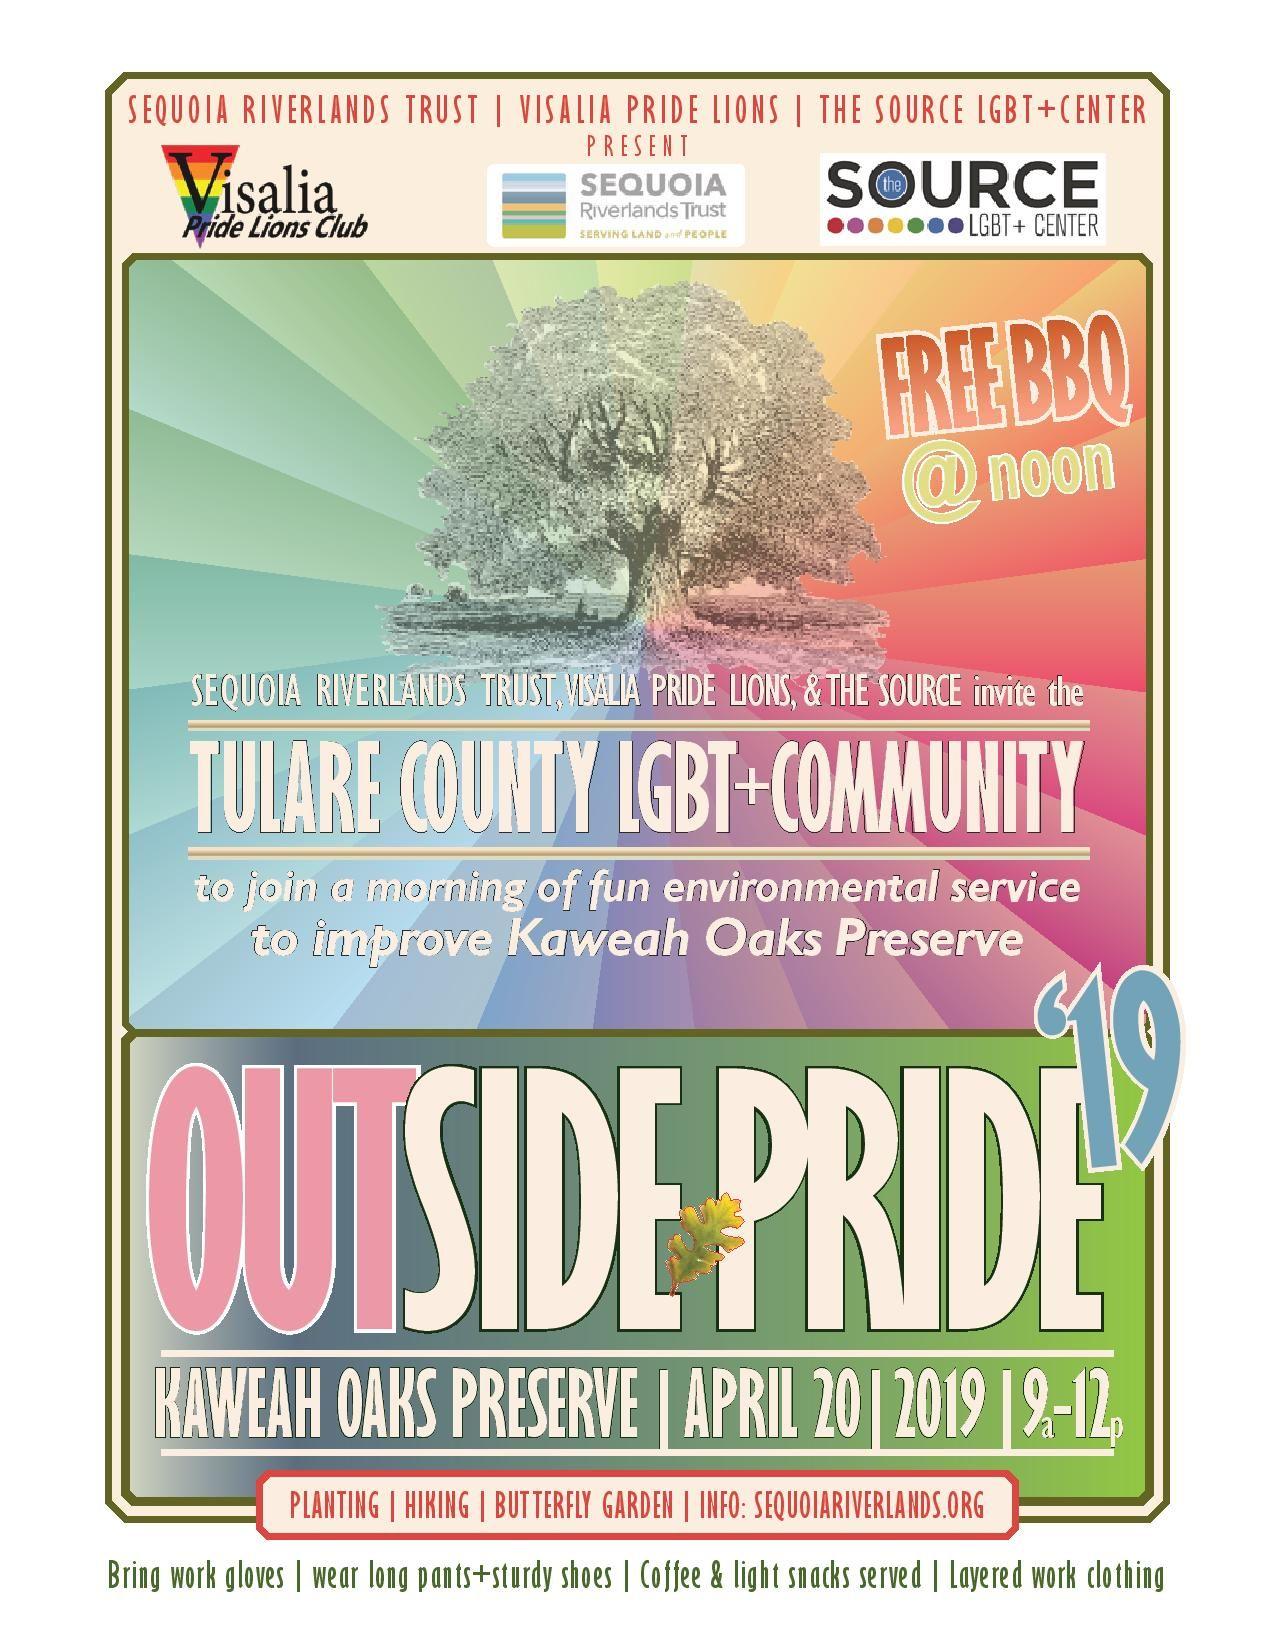 OUTside Pride '19 this Saturday at Kaweah Oaks